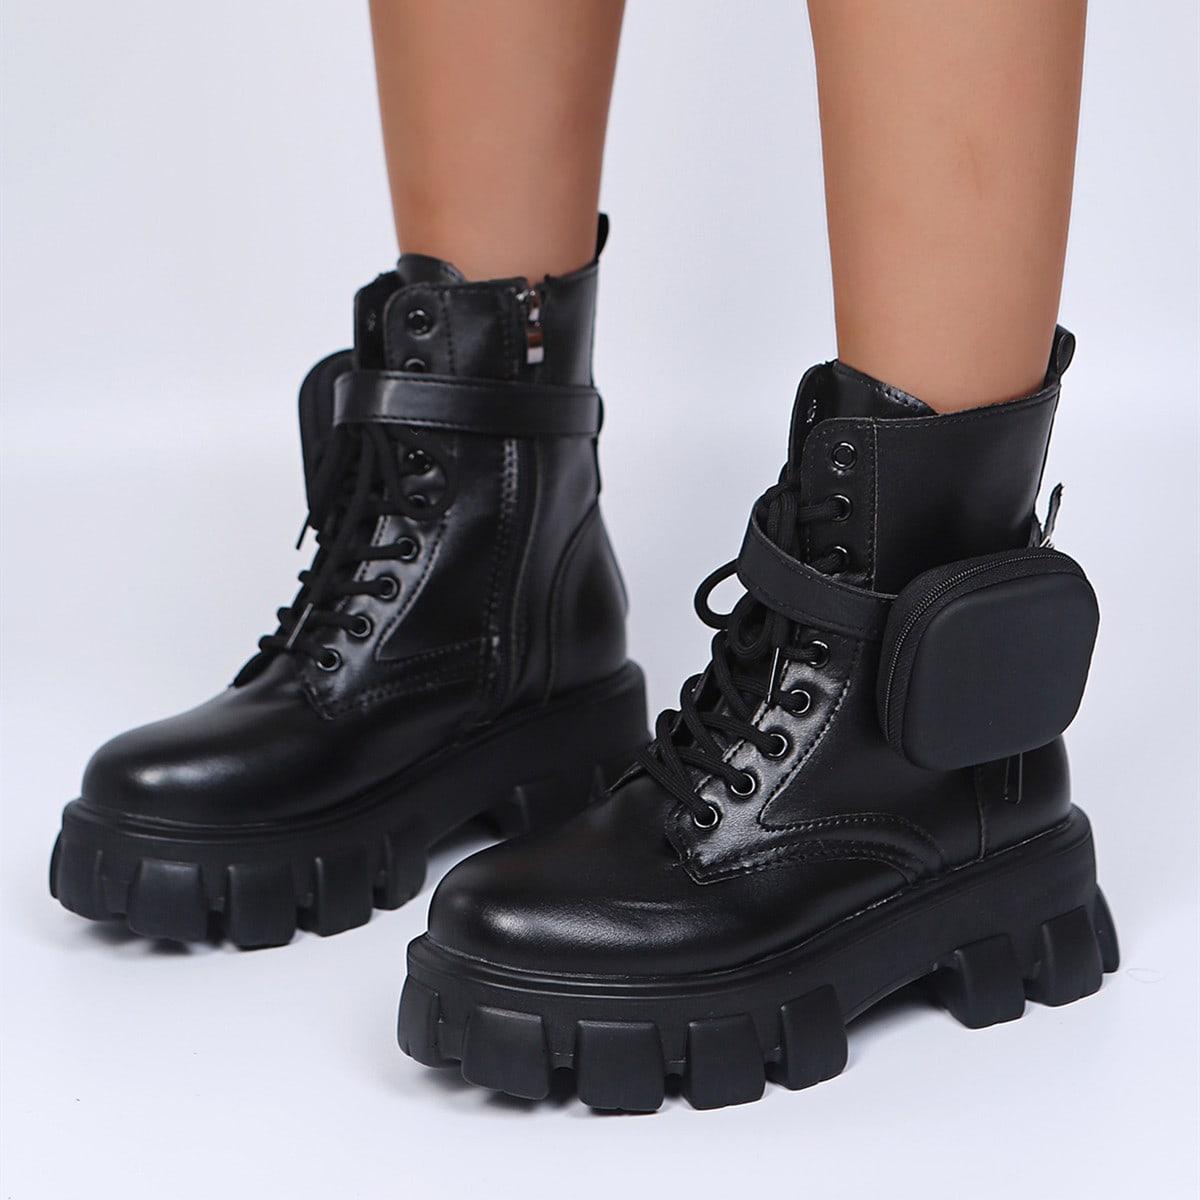 Минималистичные ботинки на шнурке